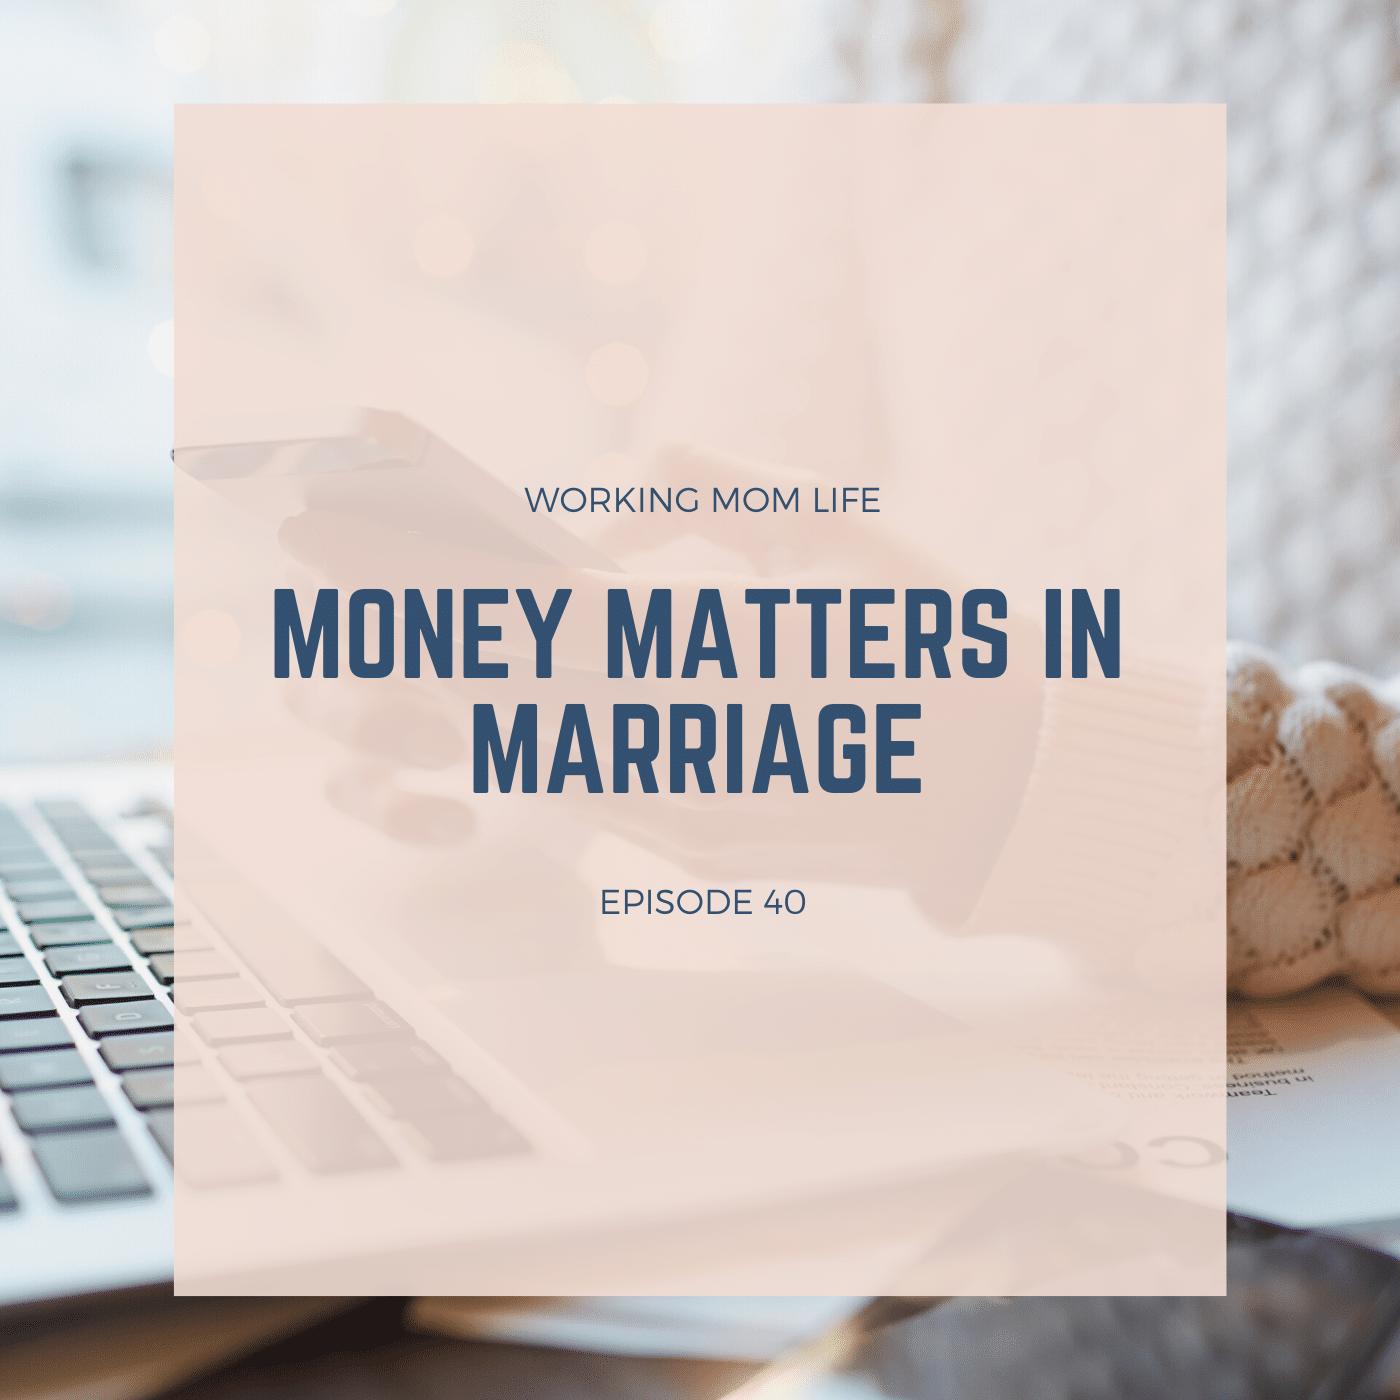 Episode 40 – Money Matters in Marriage